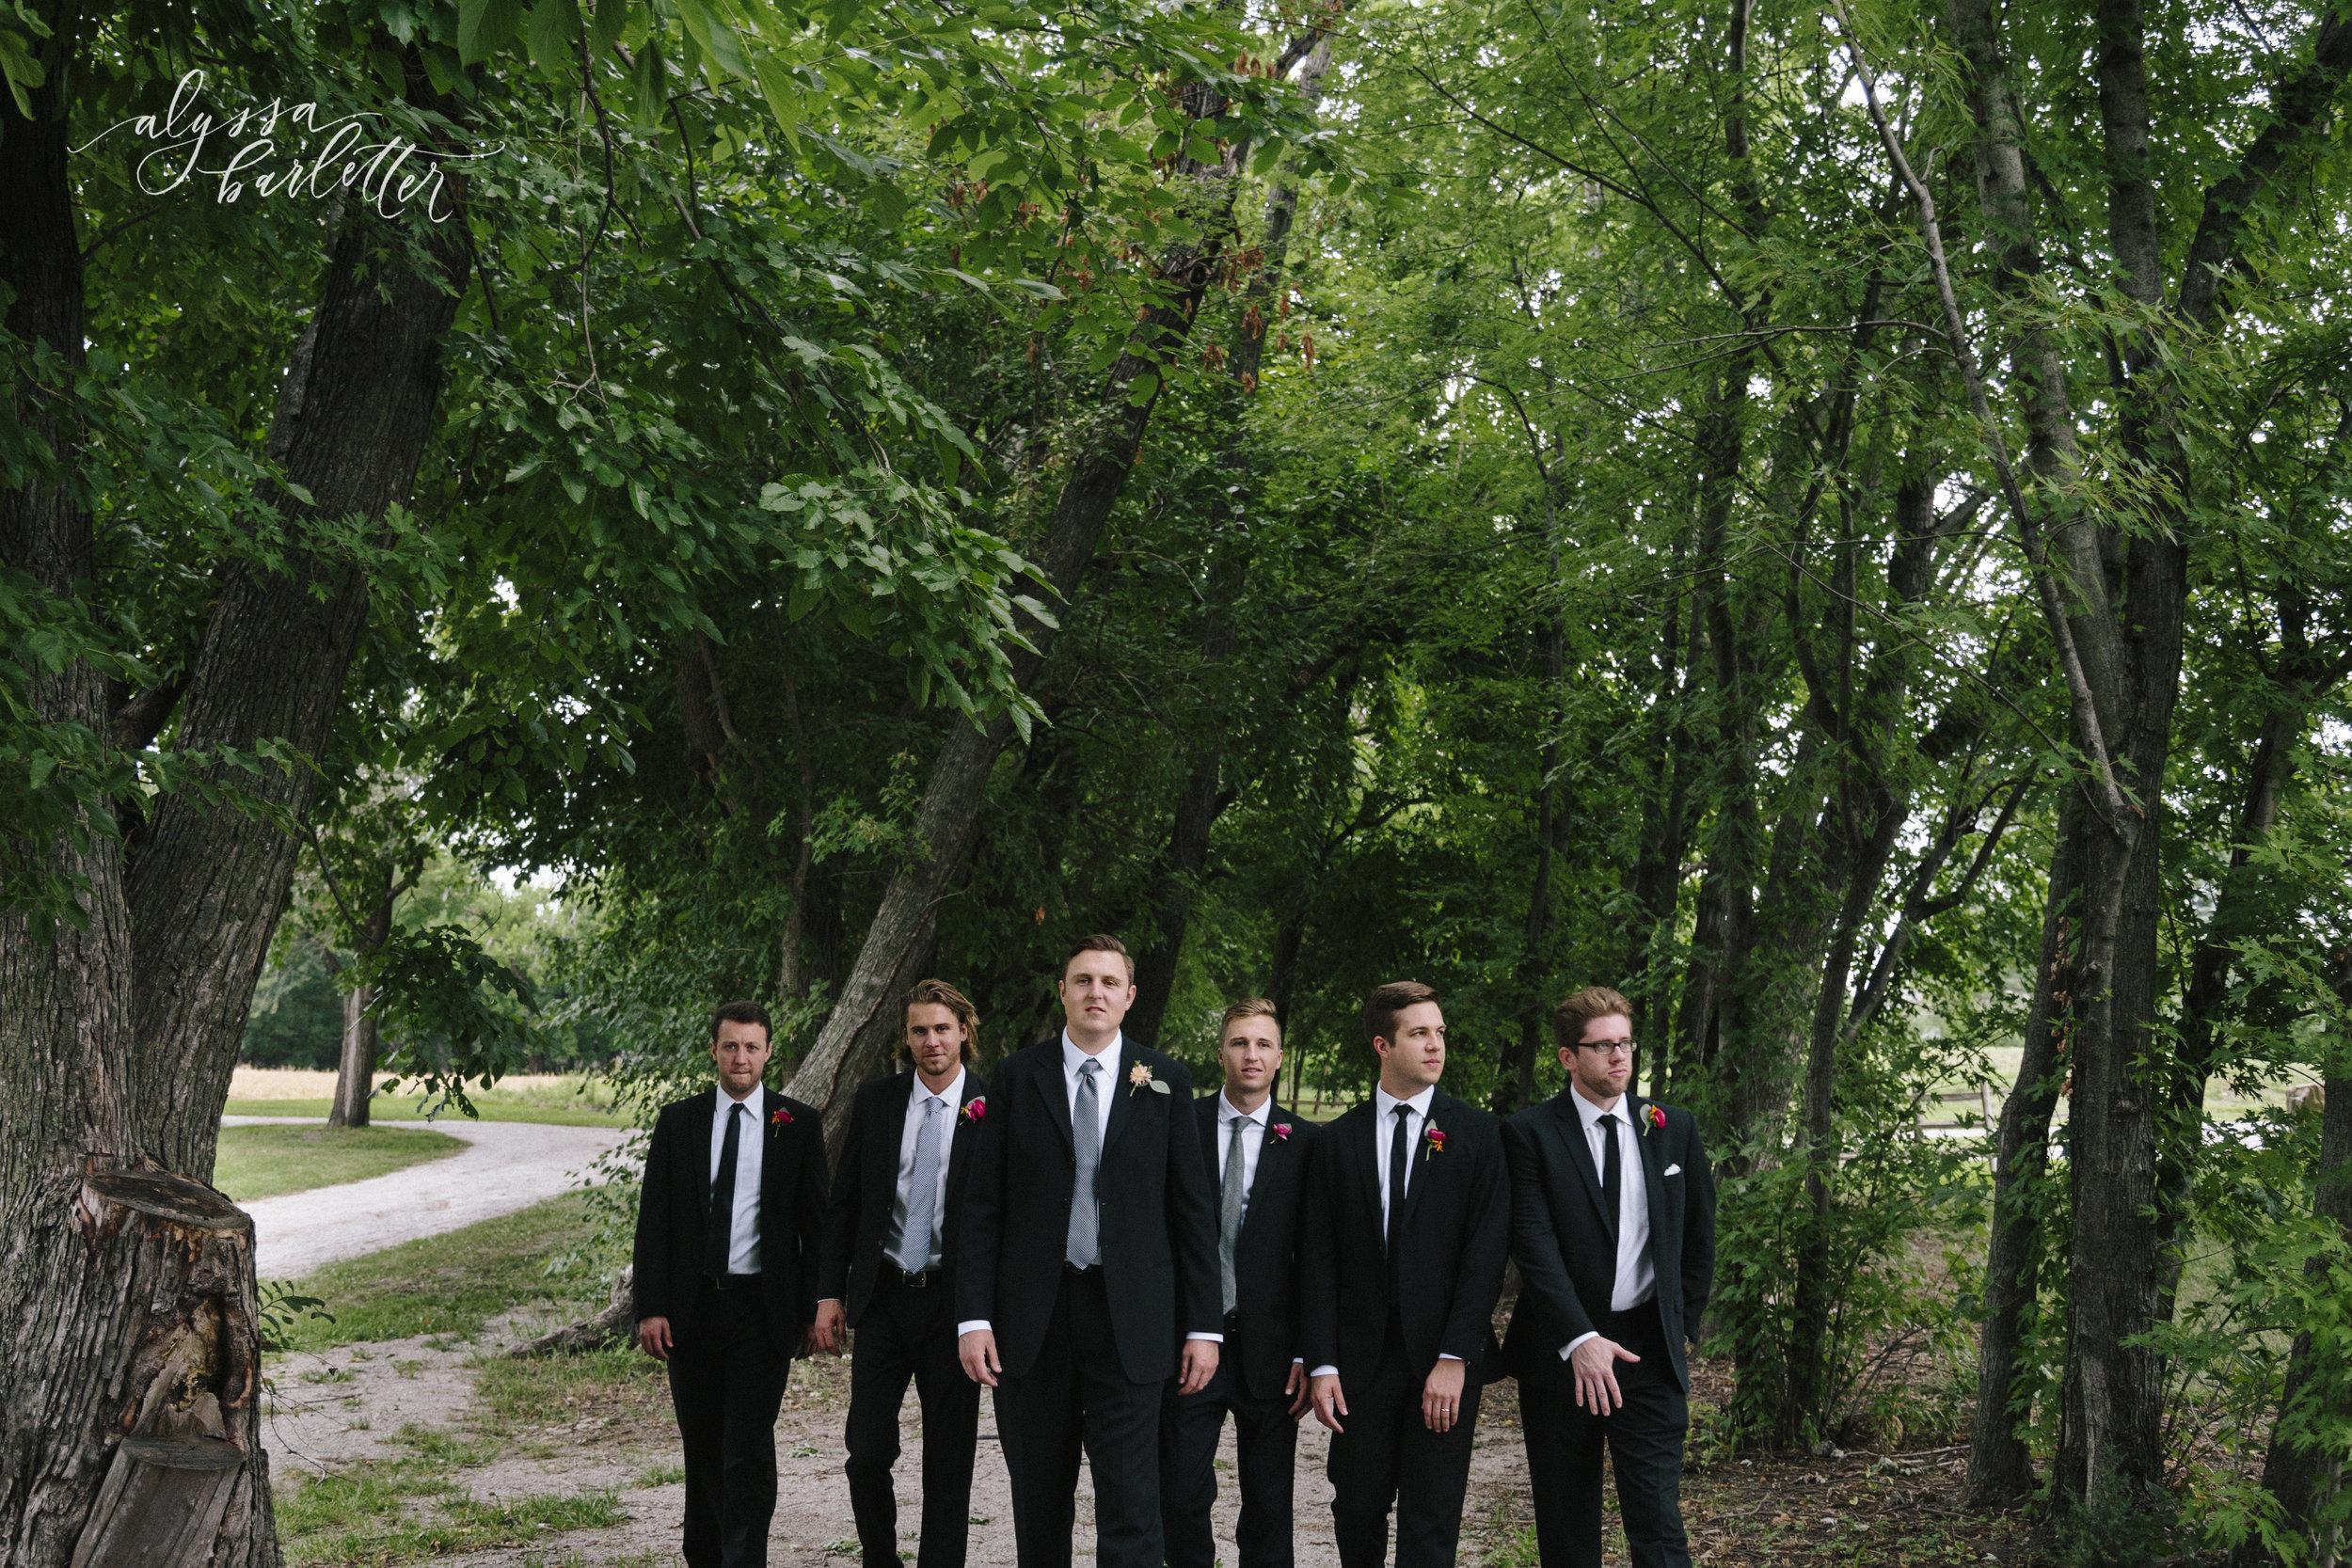 kansas city missouri wedding photographer olathe groom groomsmen suits mahaffie